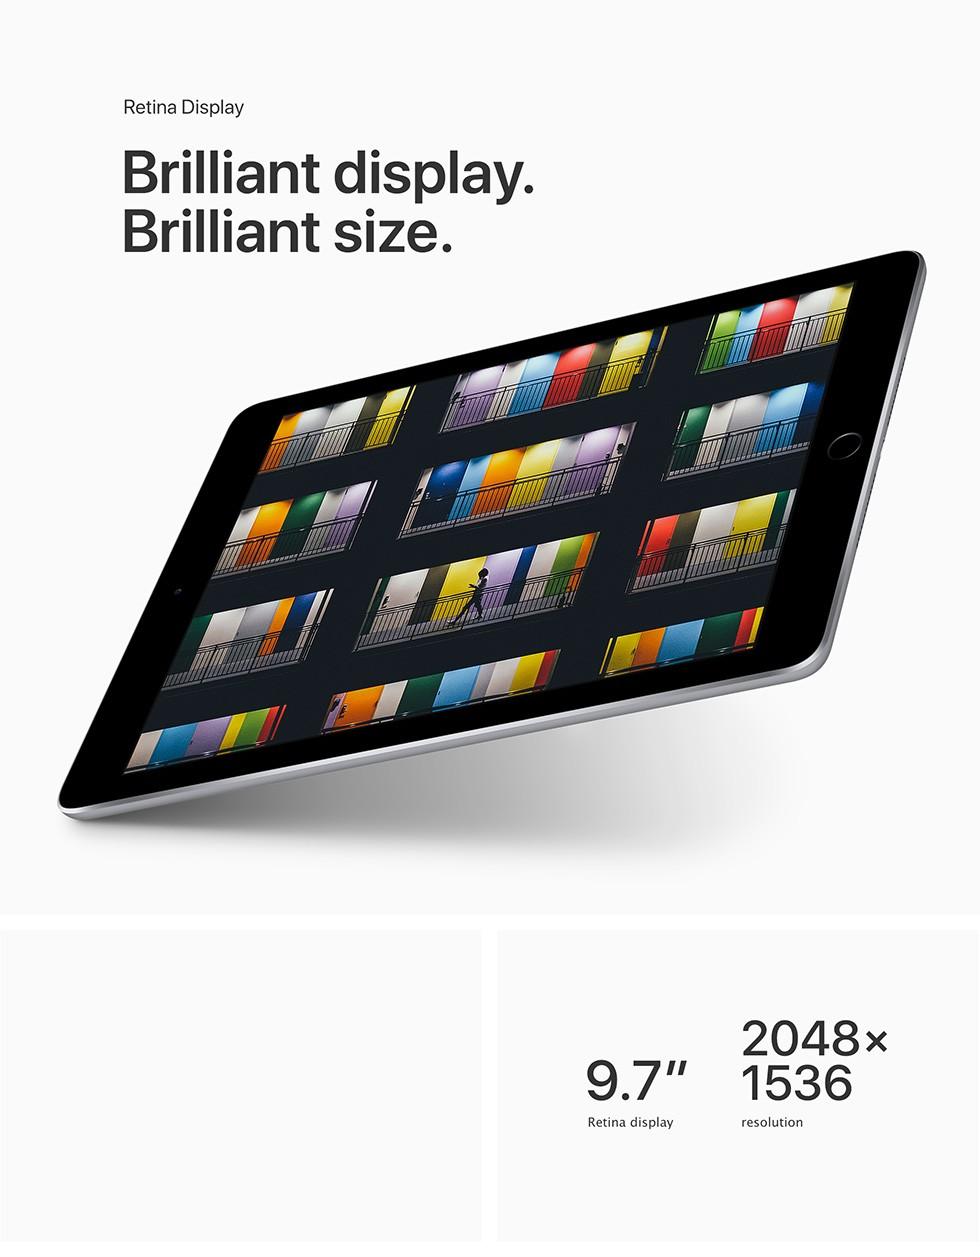 Retina Display Brilliant display. Brilliant size.